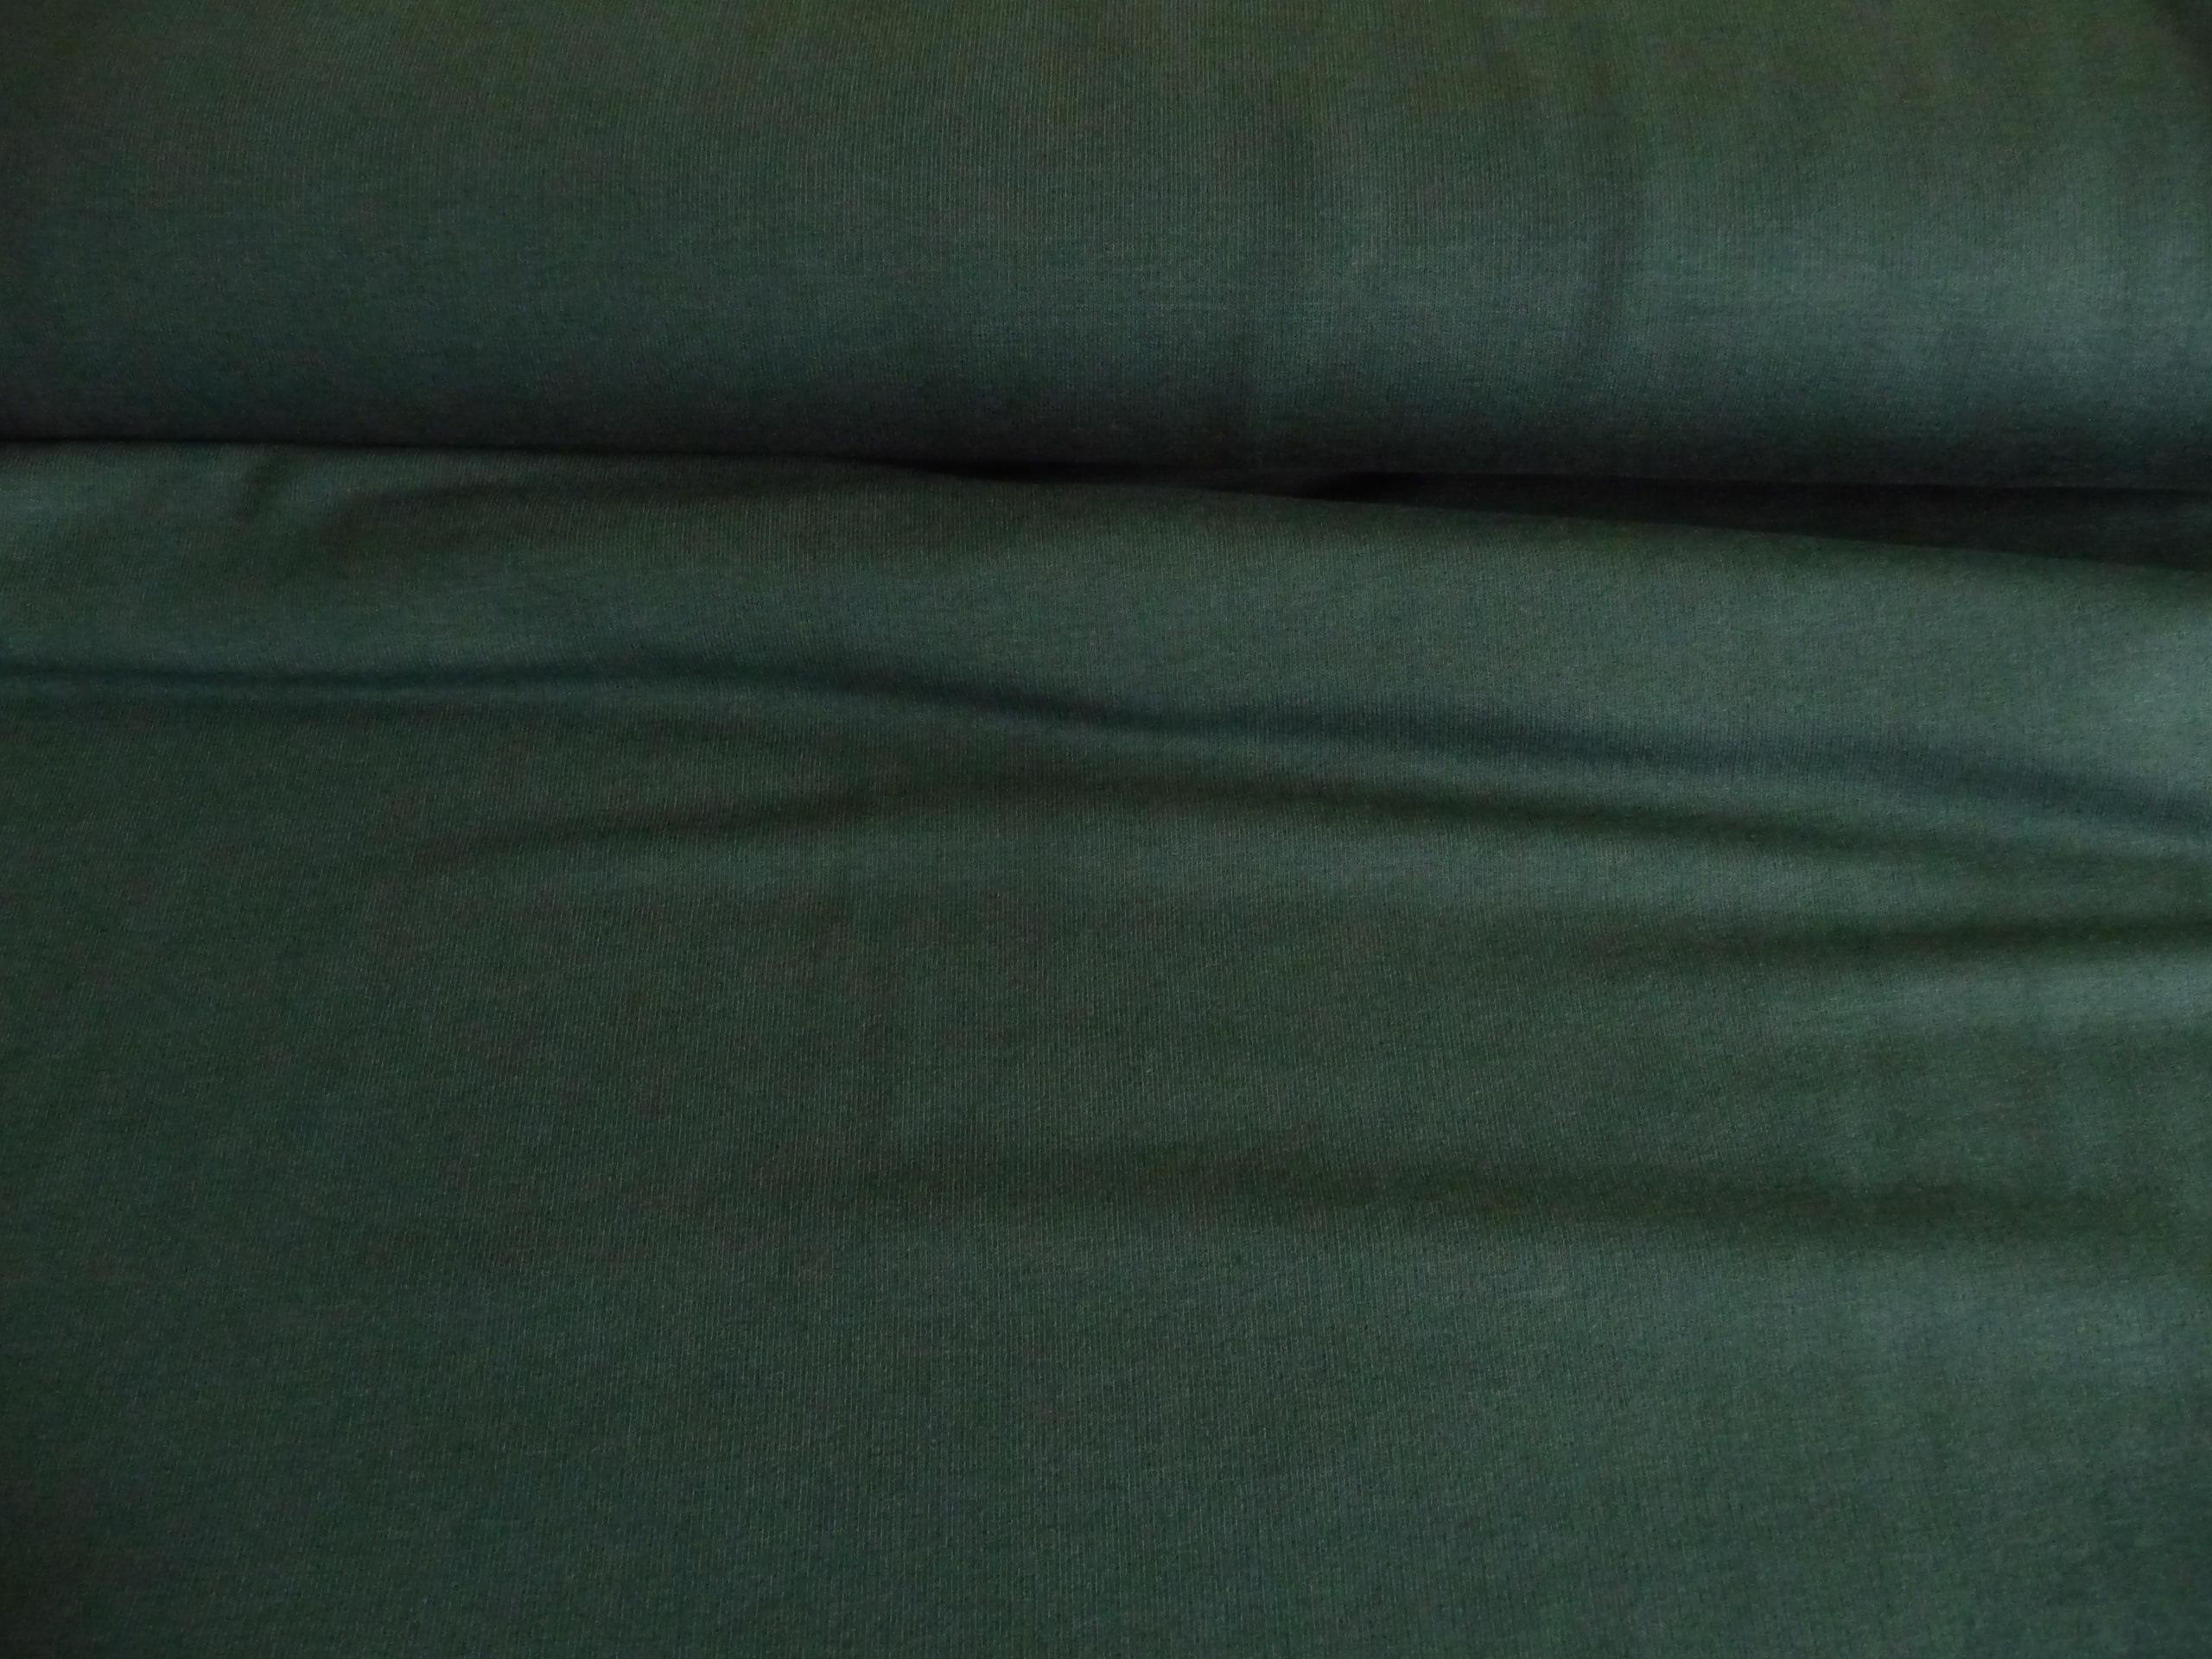 Burda Style, Jersey, Tannengrün, Viskose Jersey, Burda Style, Tannengrün, Viskose